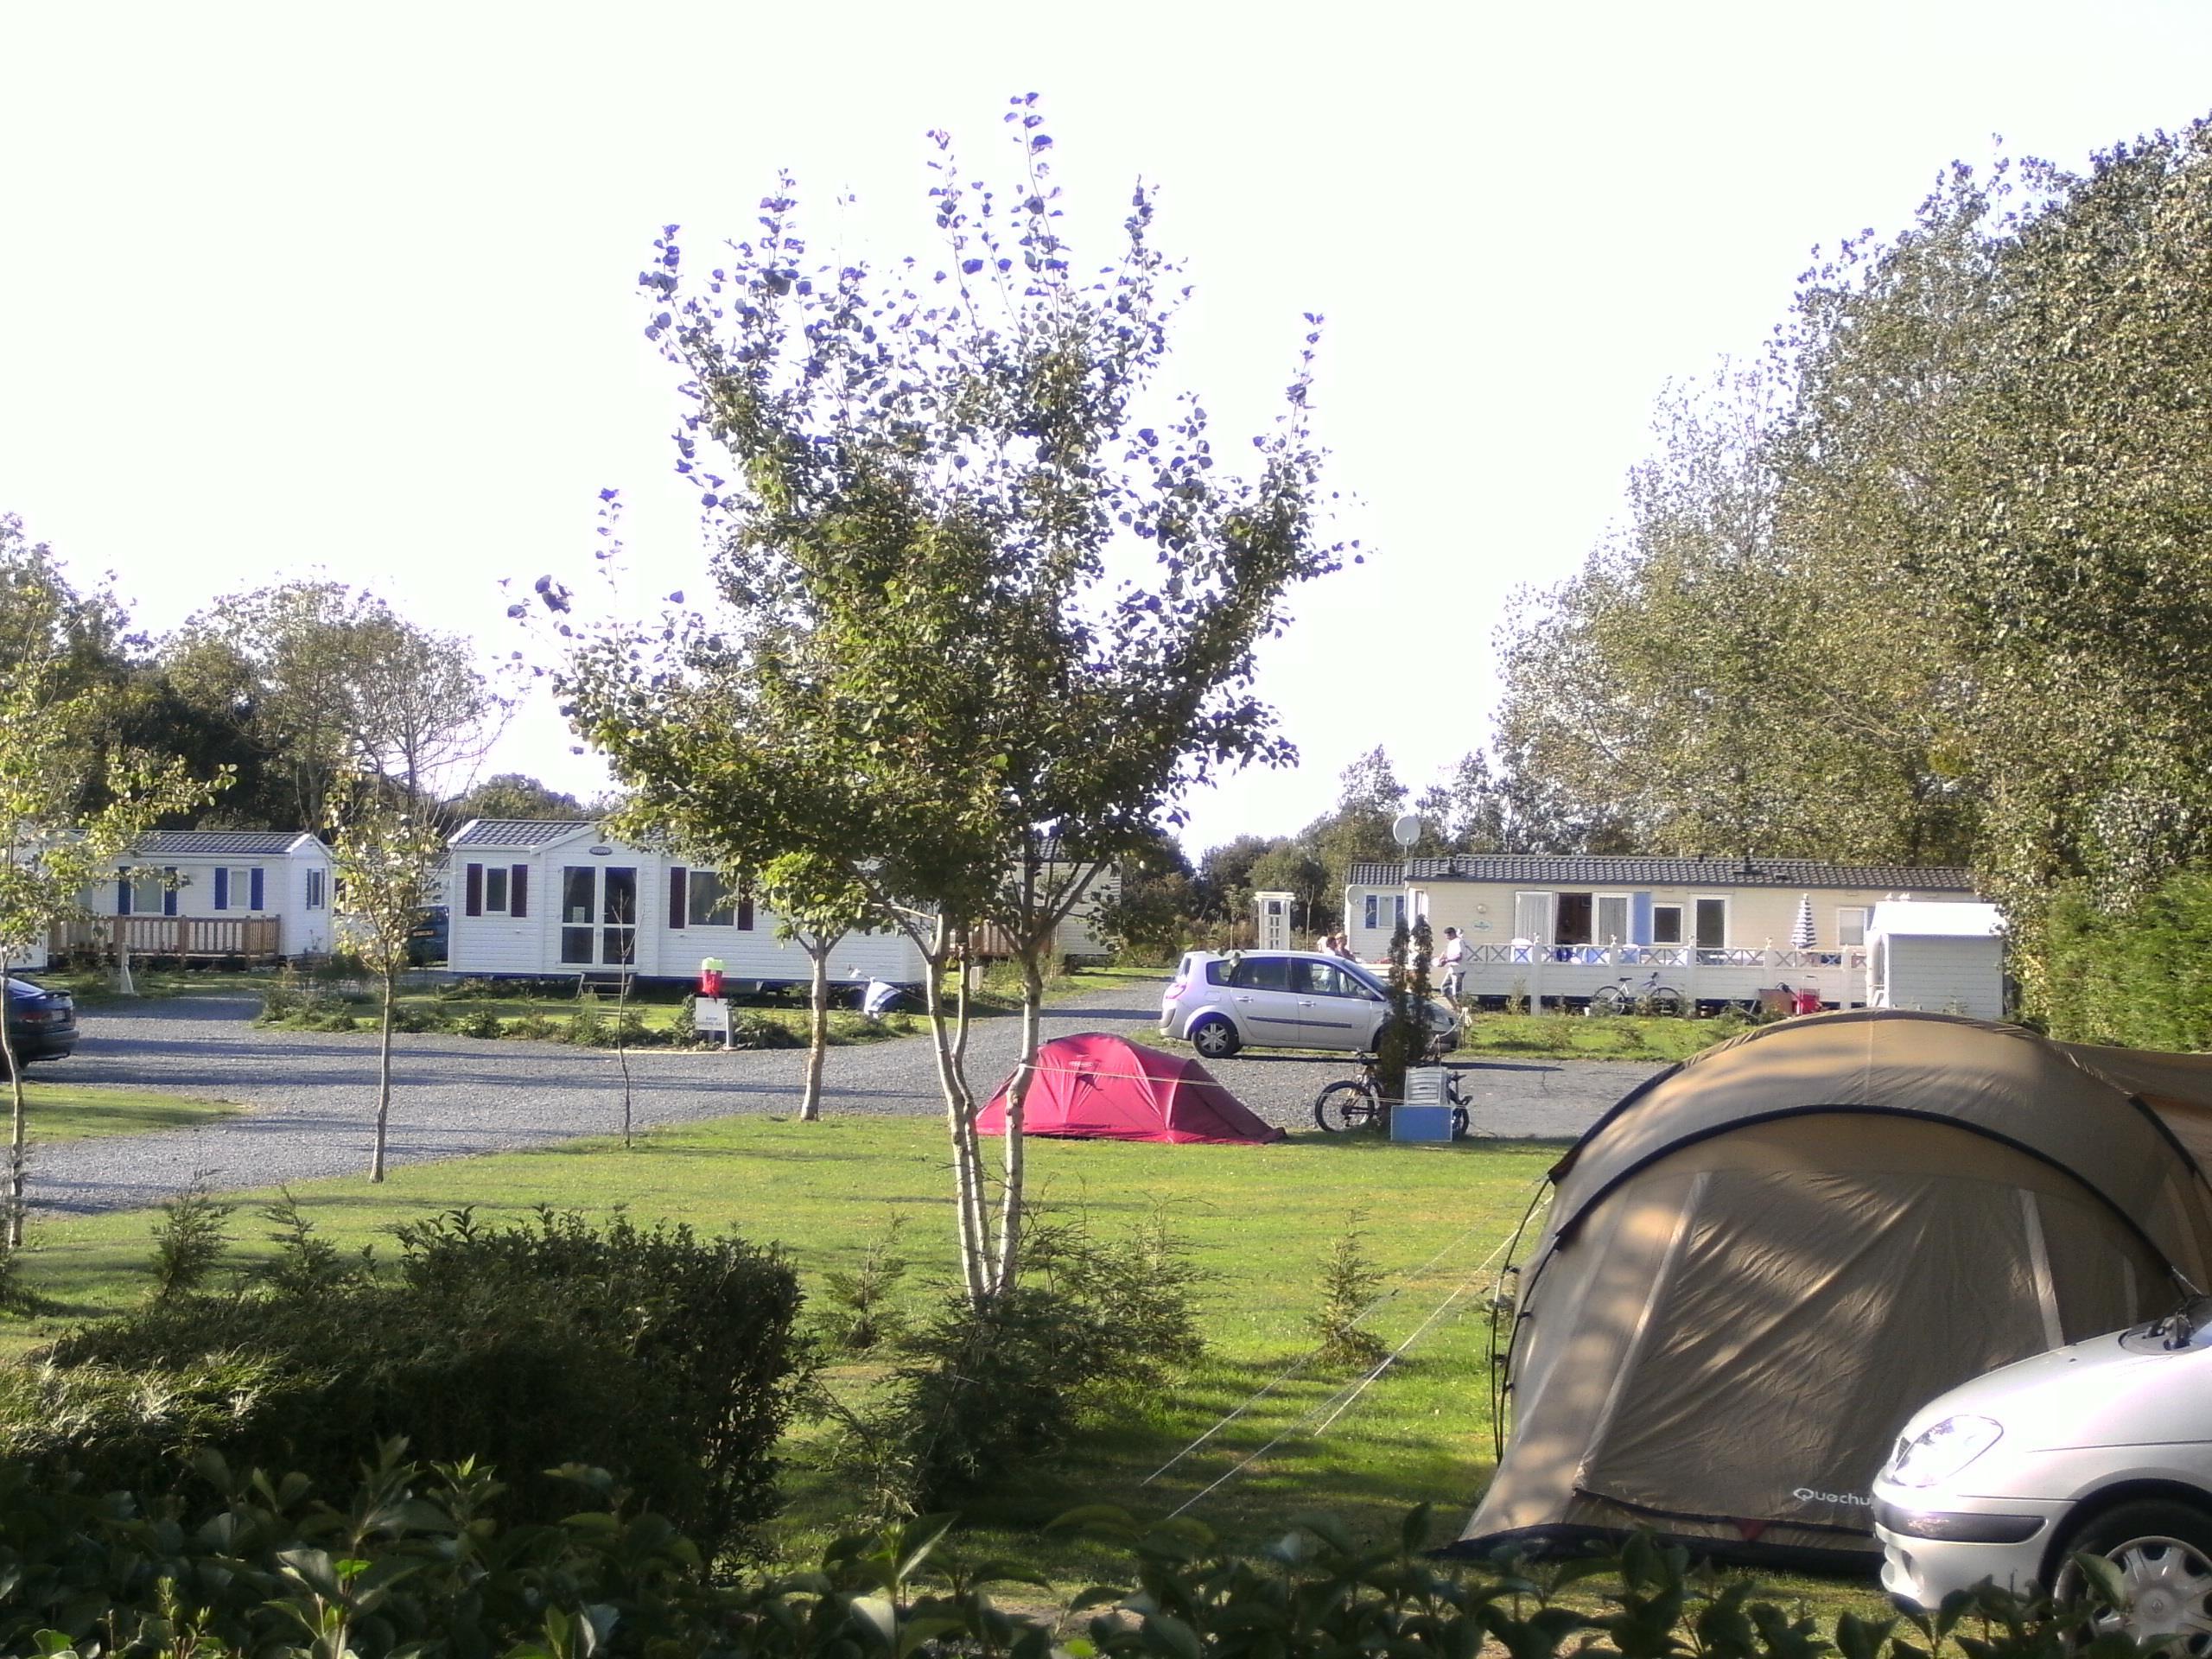 Camping le Robinson, Colleville-sur-Mer, Calvados